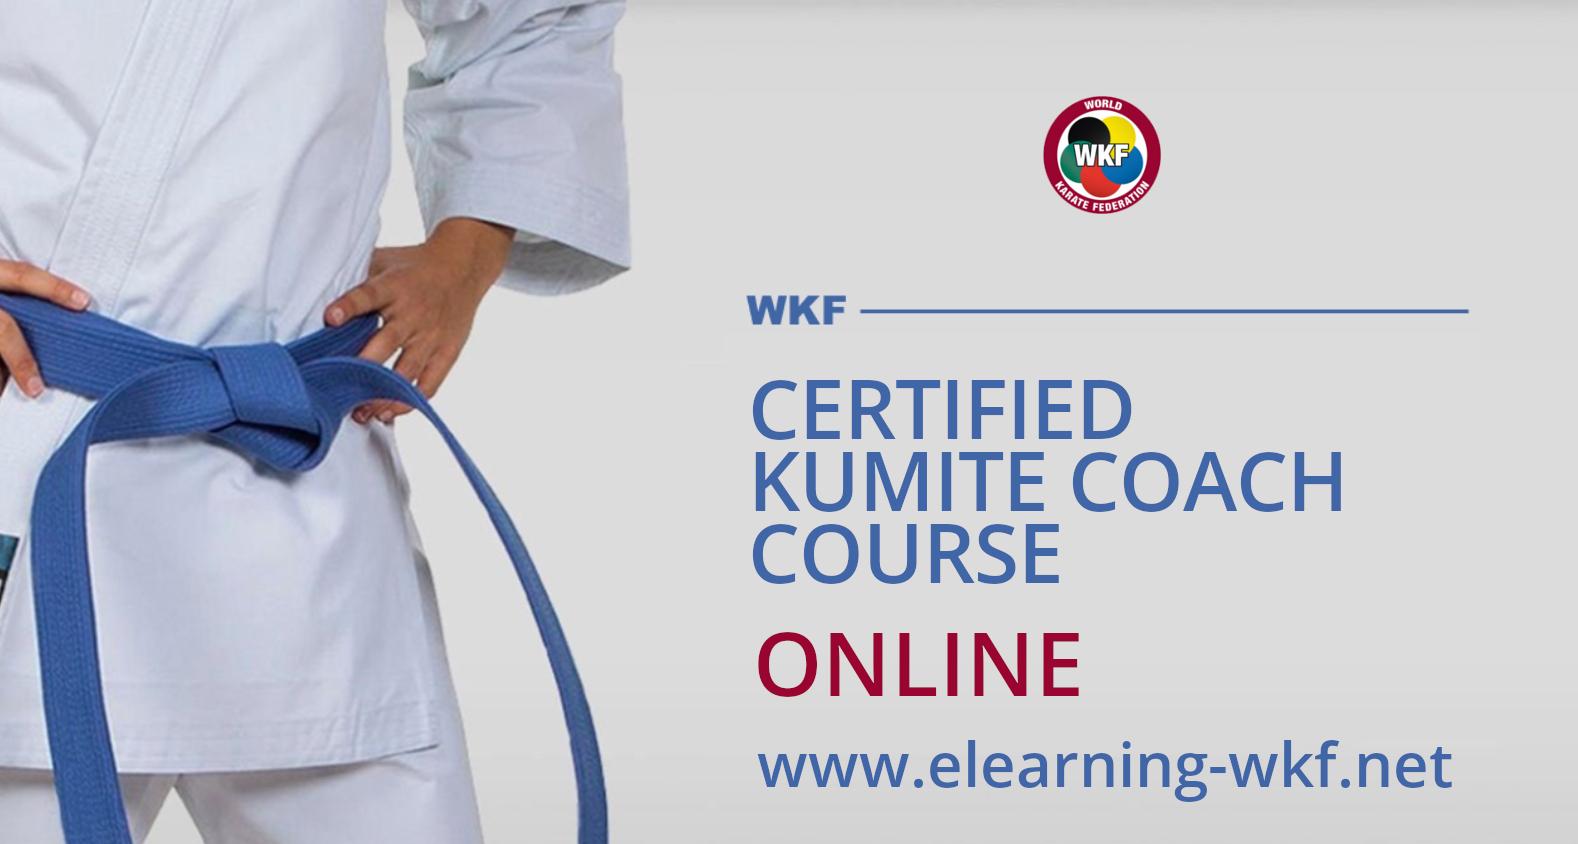 WKF Certified Kumite Coach Course